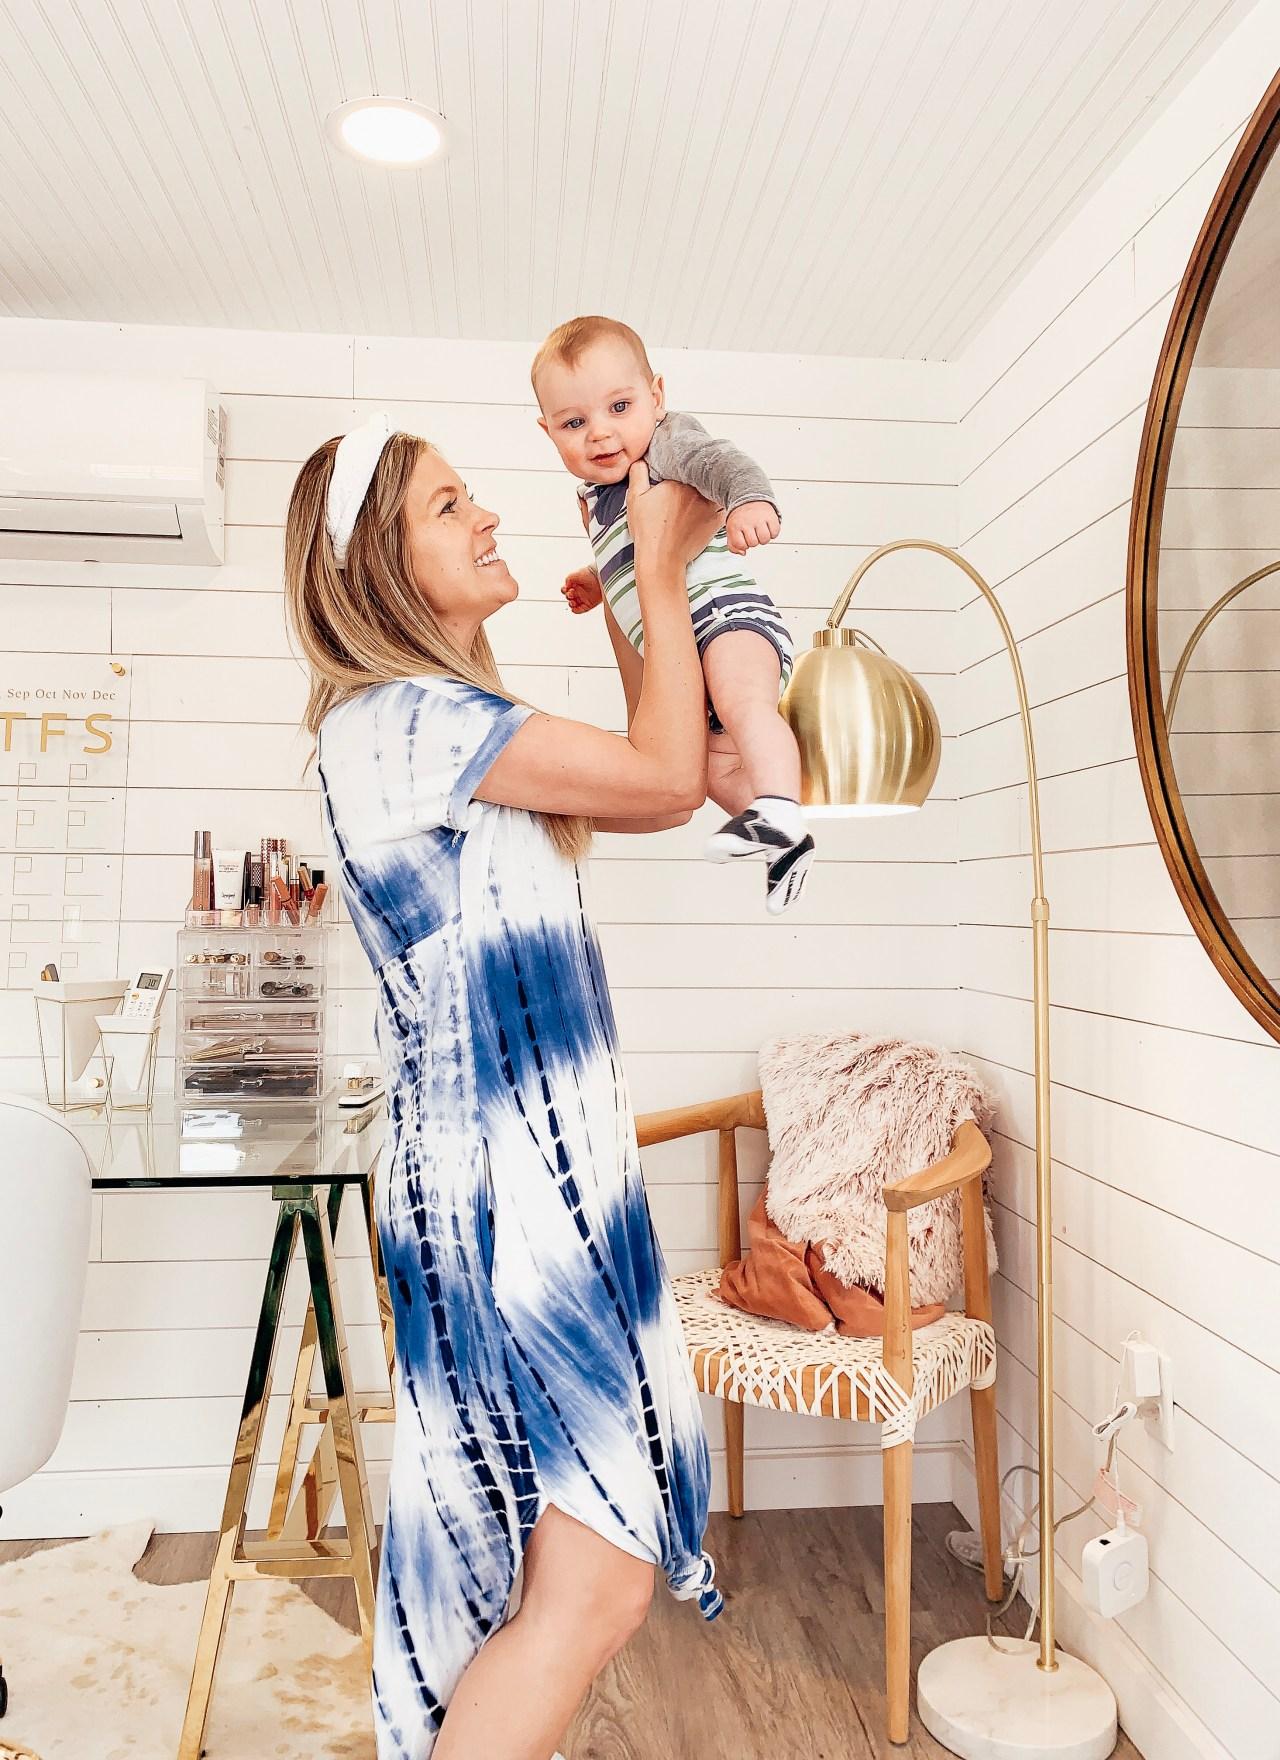 QVC's Smart Home Savings